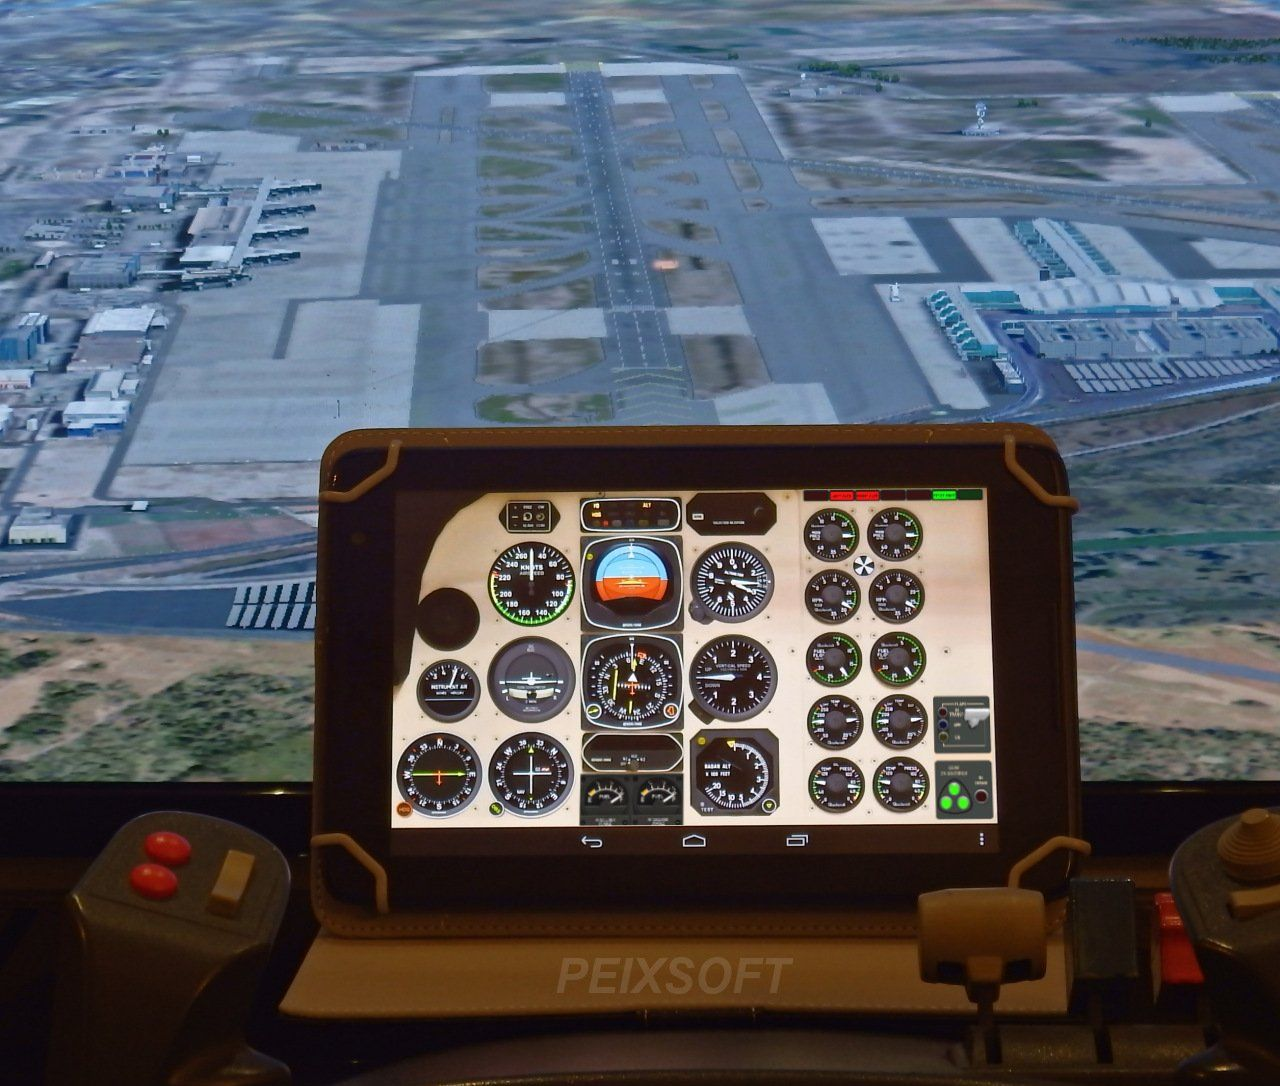 GA Panel for Android Flight simulator, Flight simulator